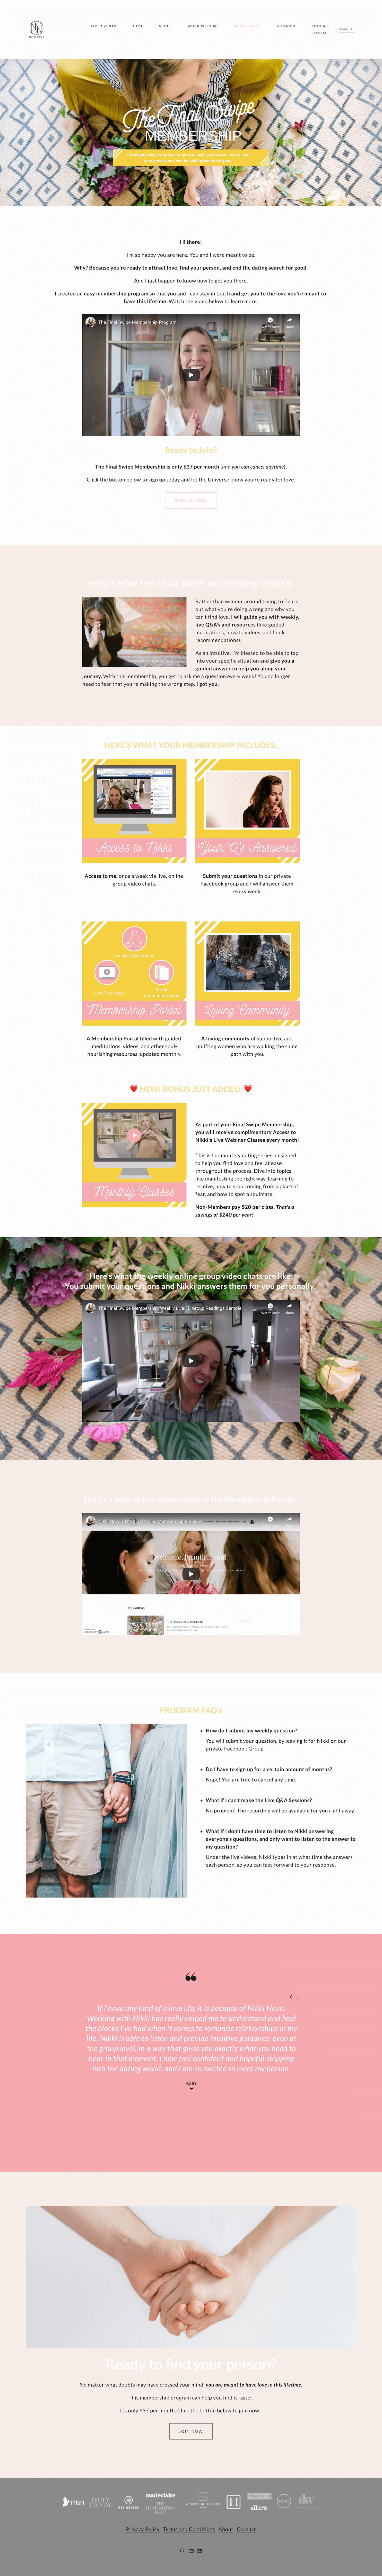 Squarespace Sales Page for Intuitive Relationship Coach, Nikki Novo. © 2019 Awake Website Design.